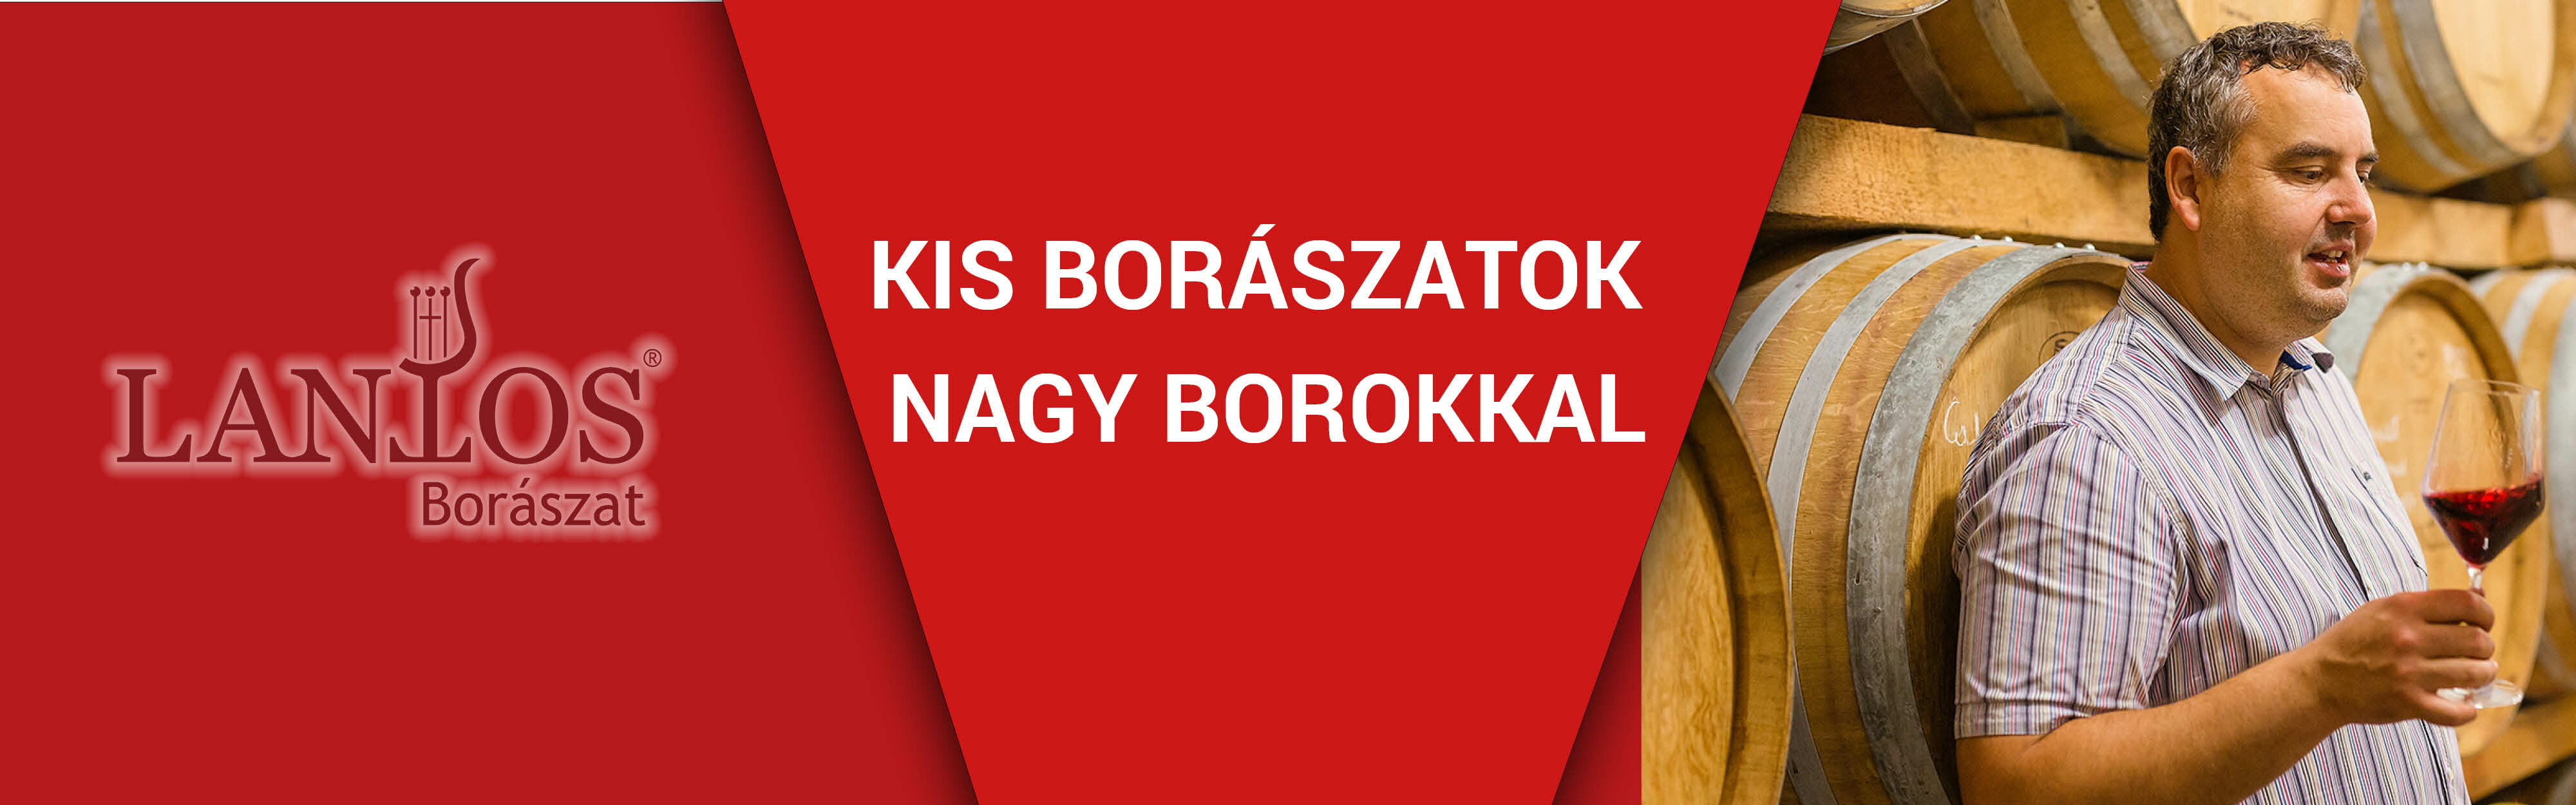 Lantos Borok - Lantos Borászat interjú